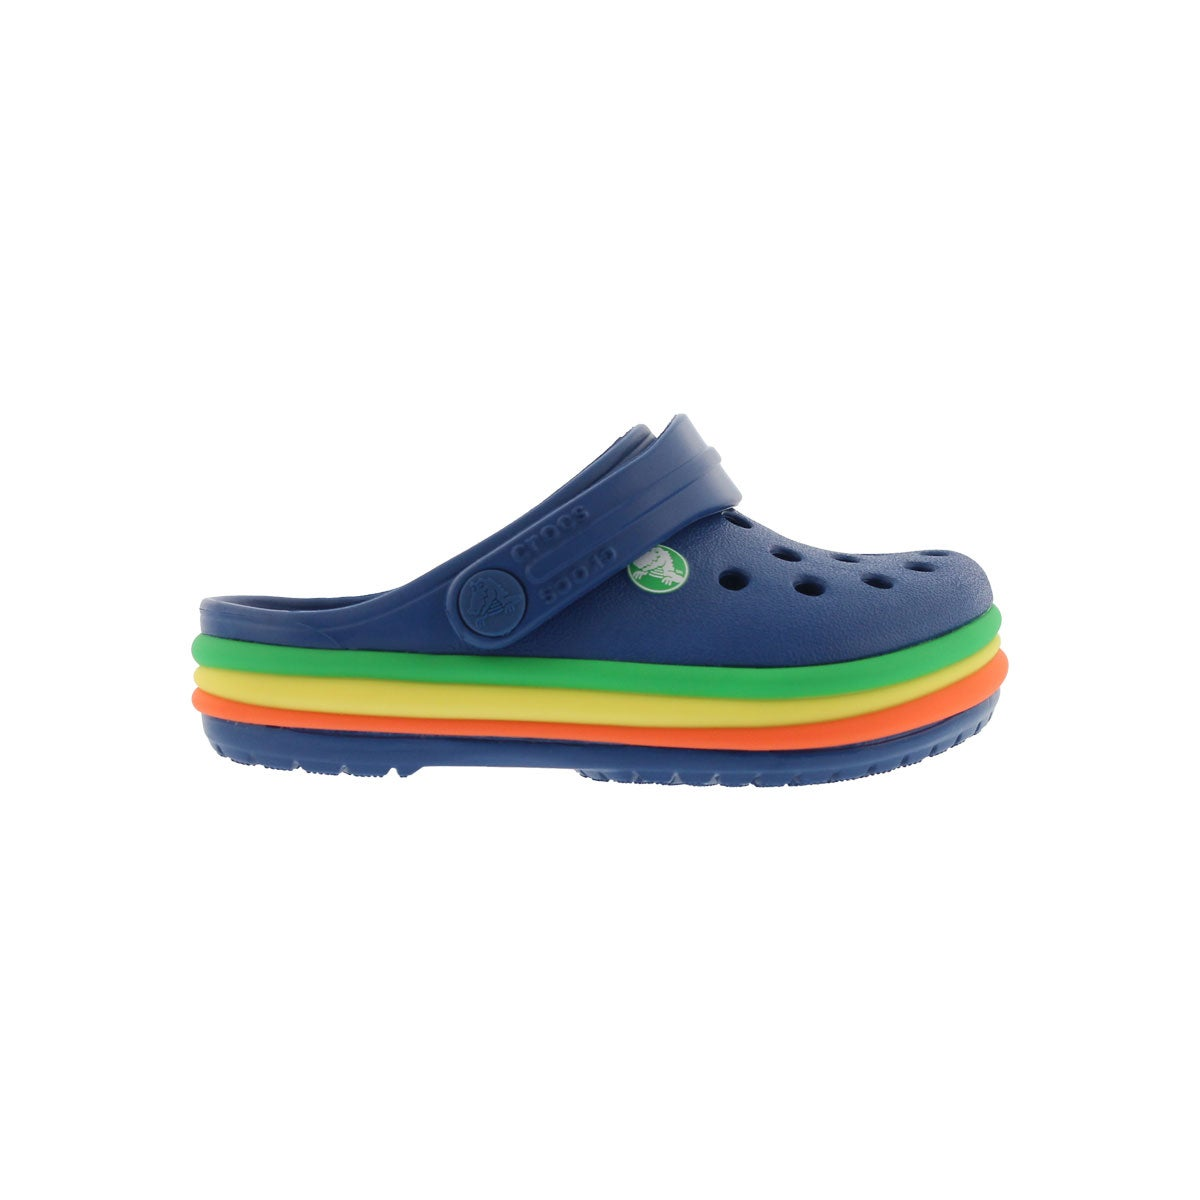 Infs CB Rainbow Band blue jean EVA clog